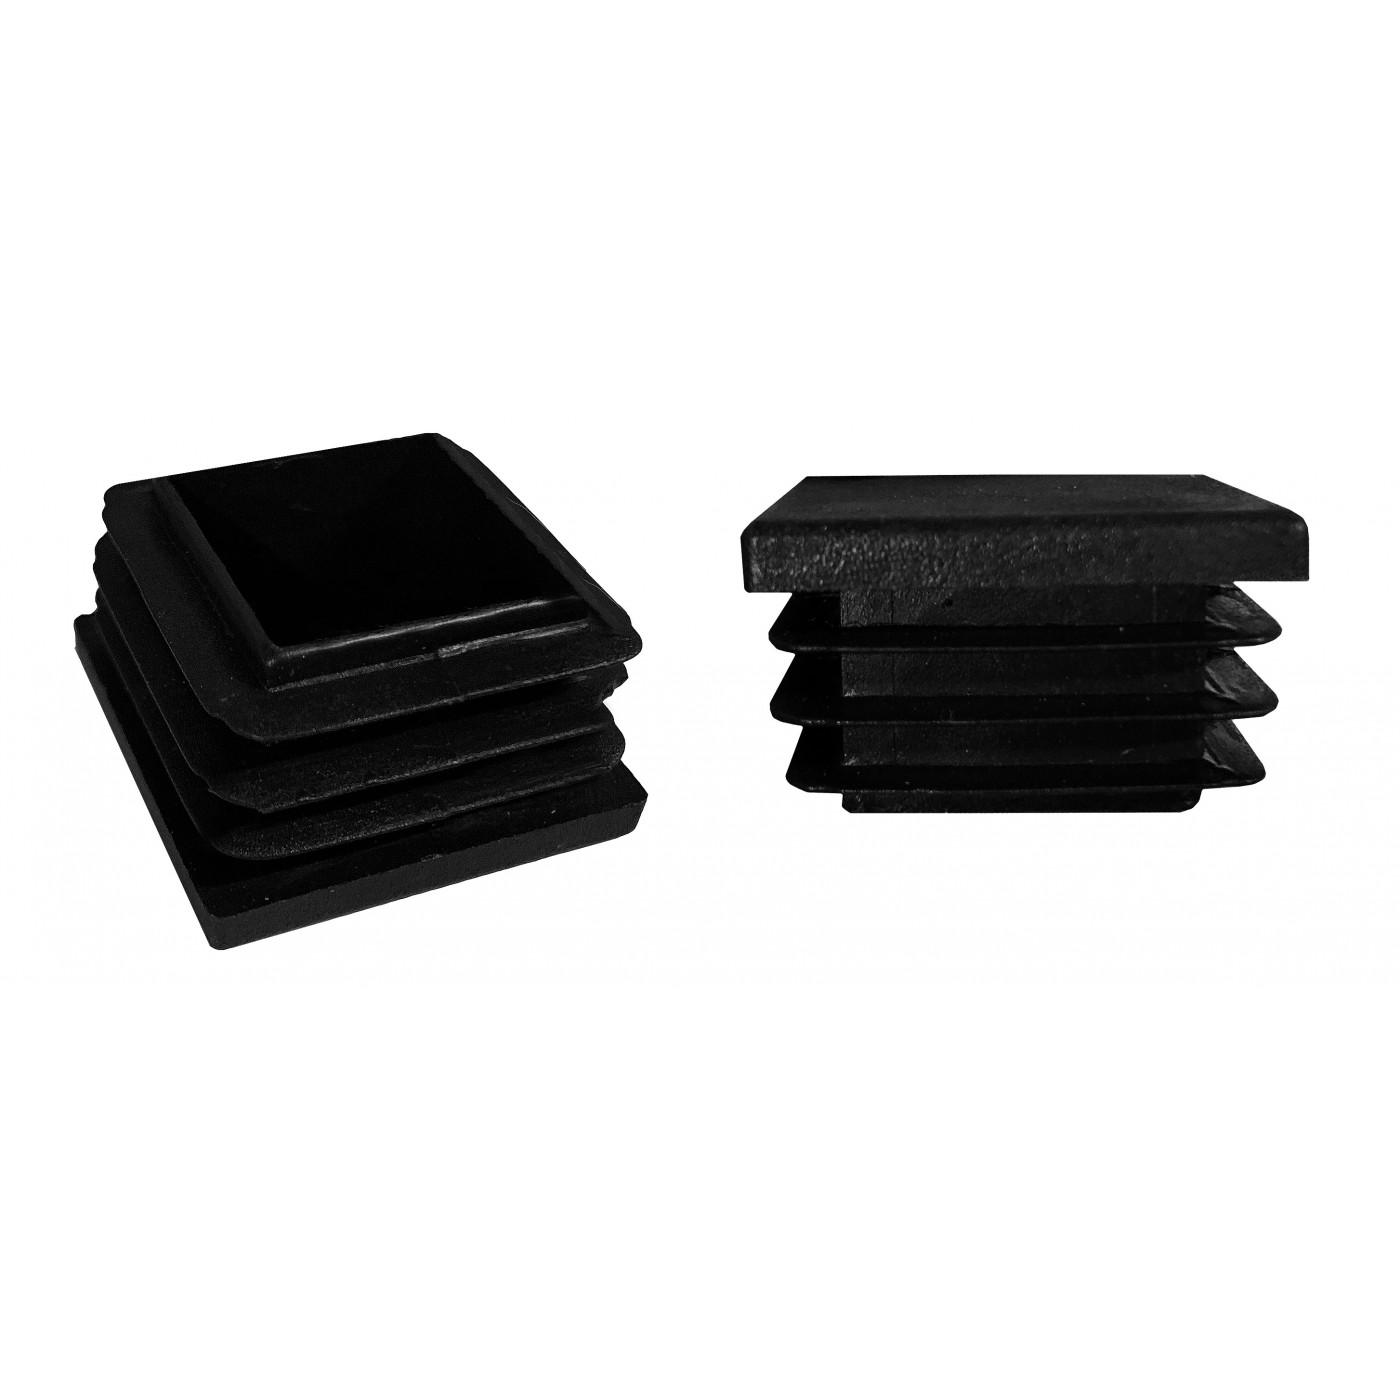 Set of 50 chair leg caps (F10/E15/D16, black)